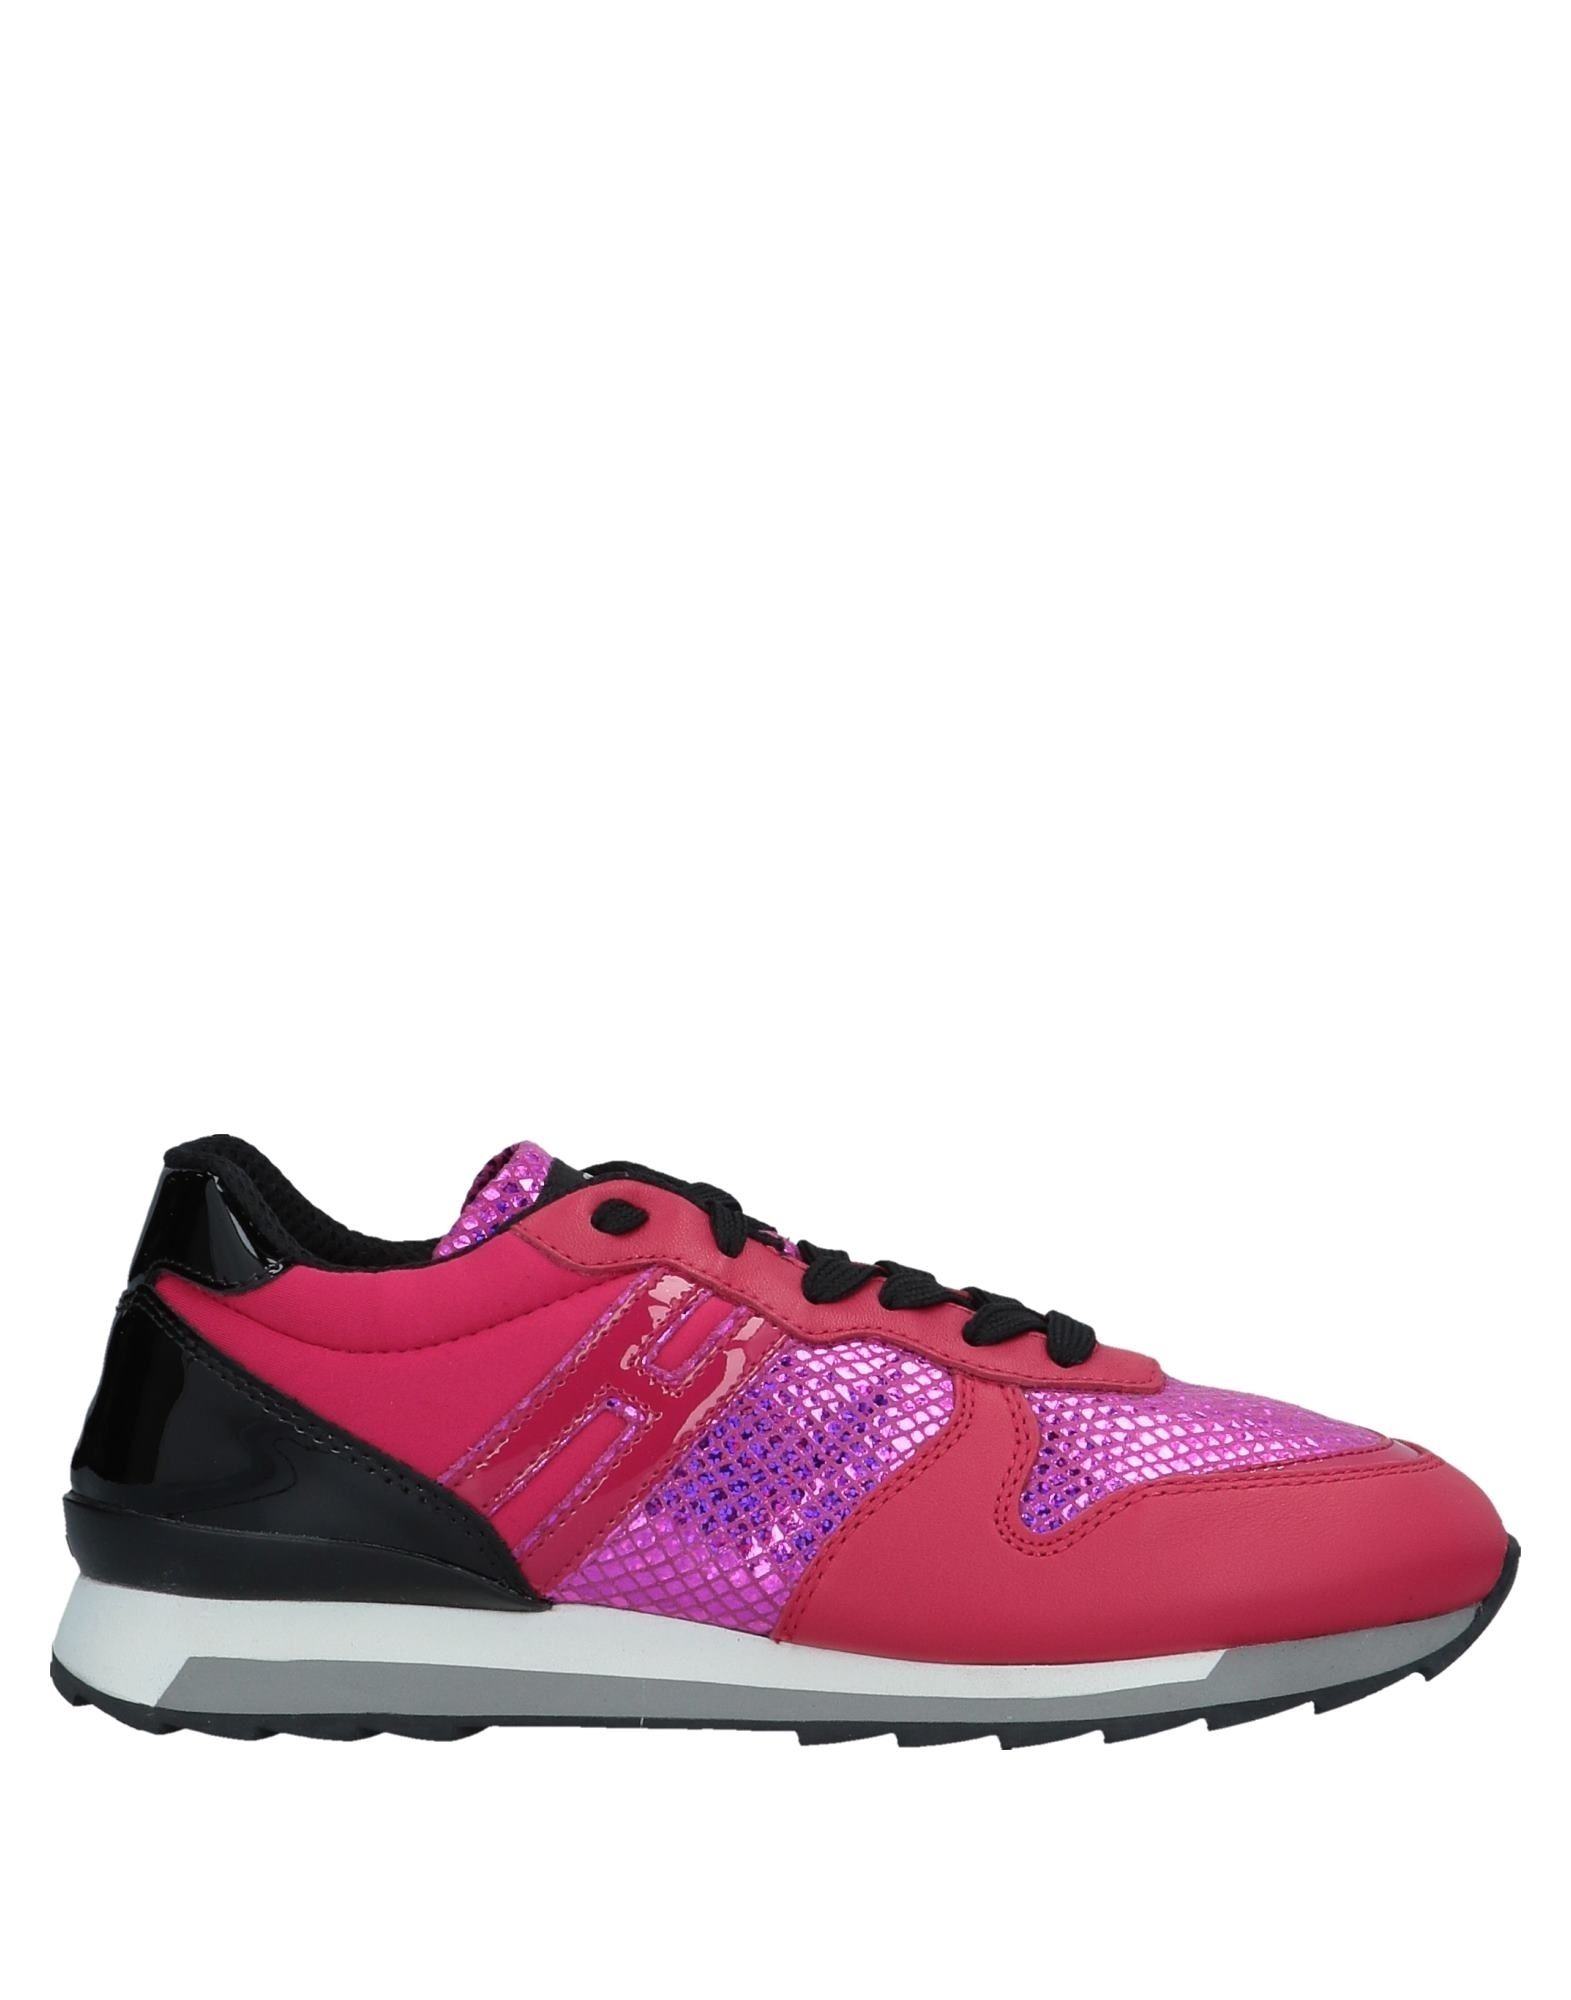 Rabatt Schuhe Sneakers Hogan Rebel Sneakers Schuhe Damen  11540015LG 483e20